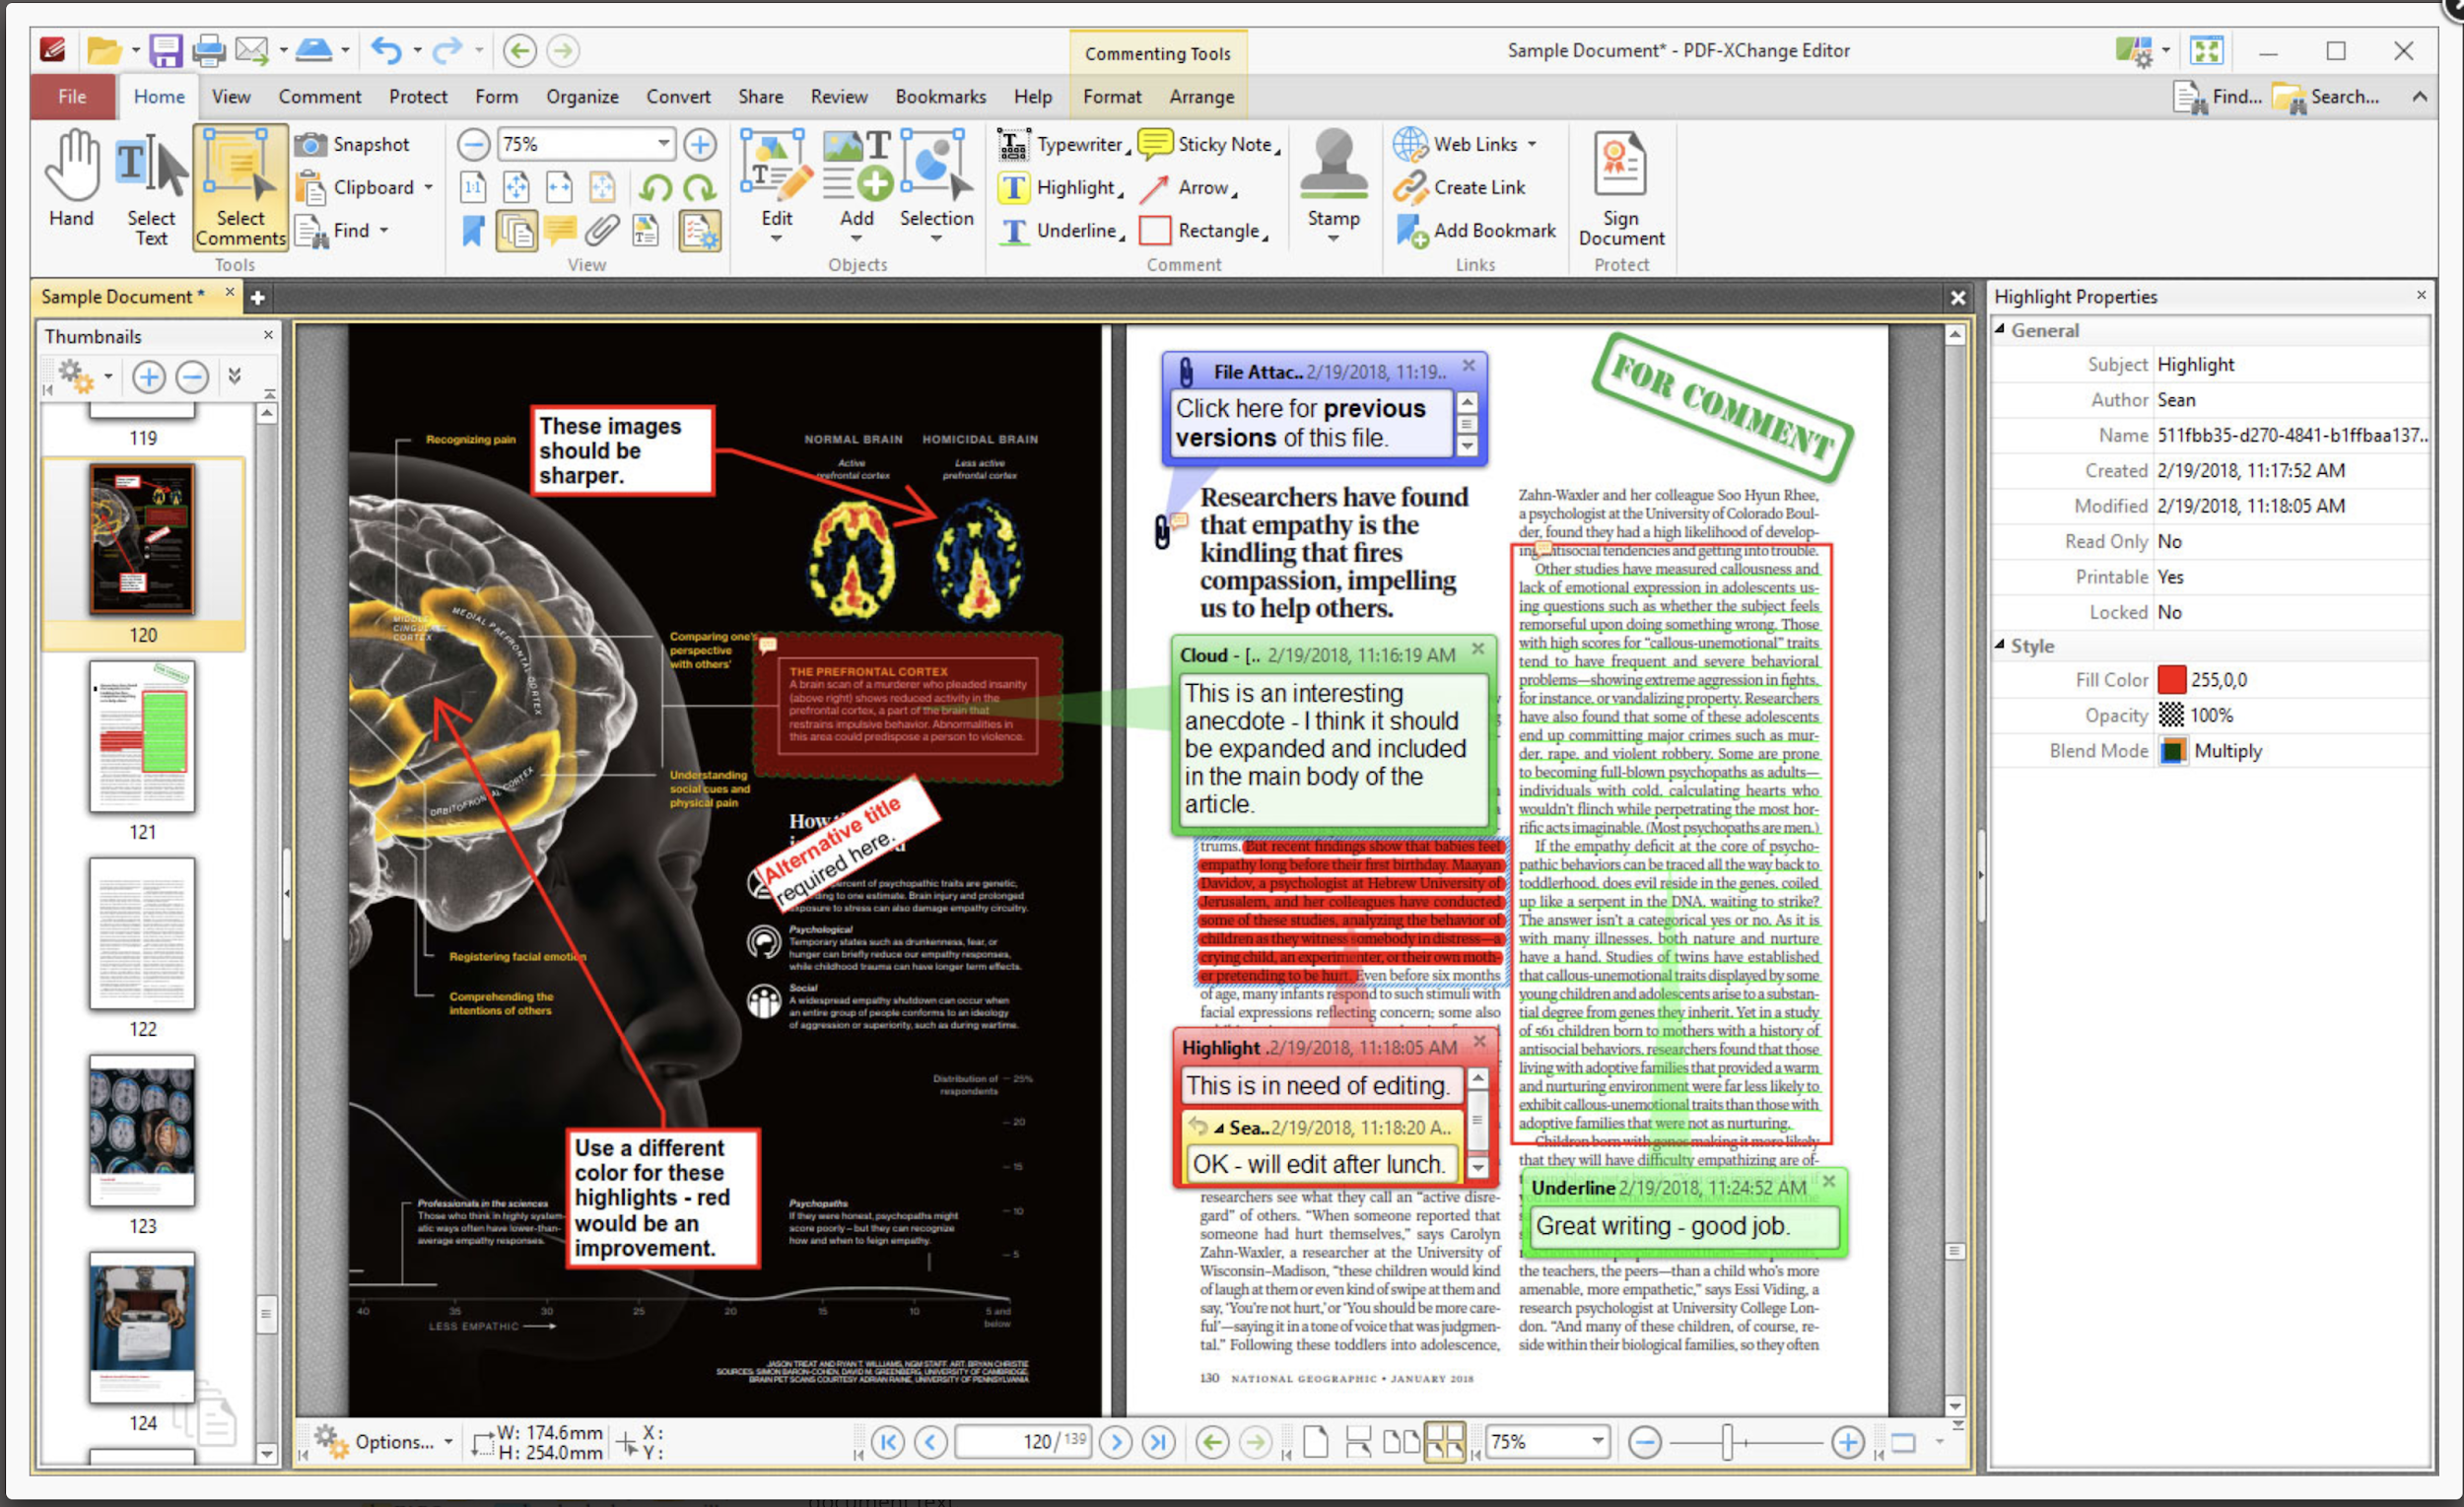 pdf-xchange editor best free pdf editor